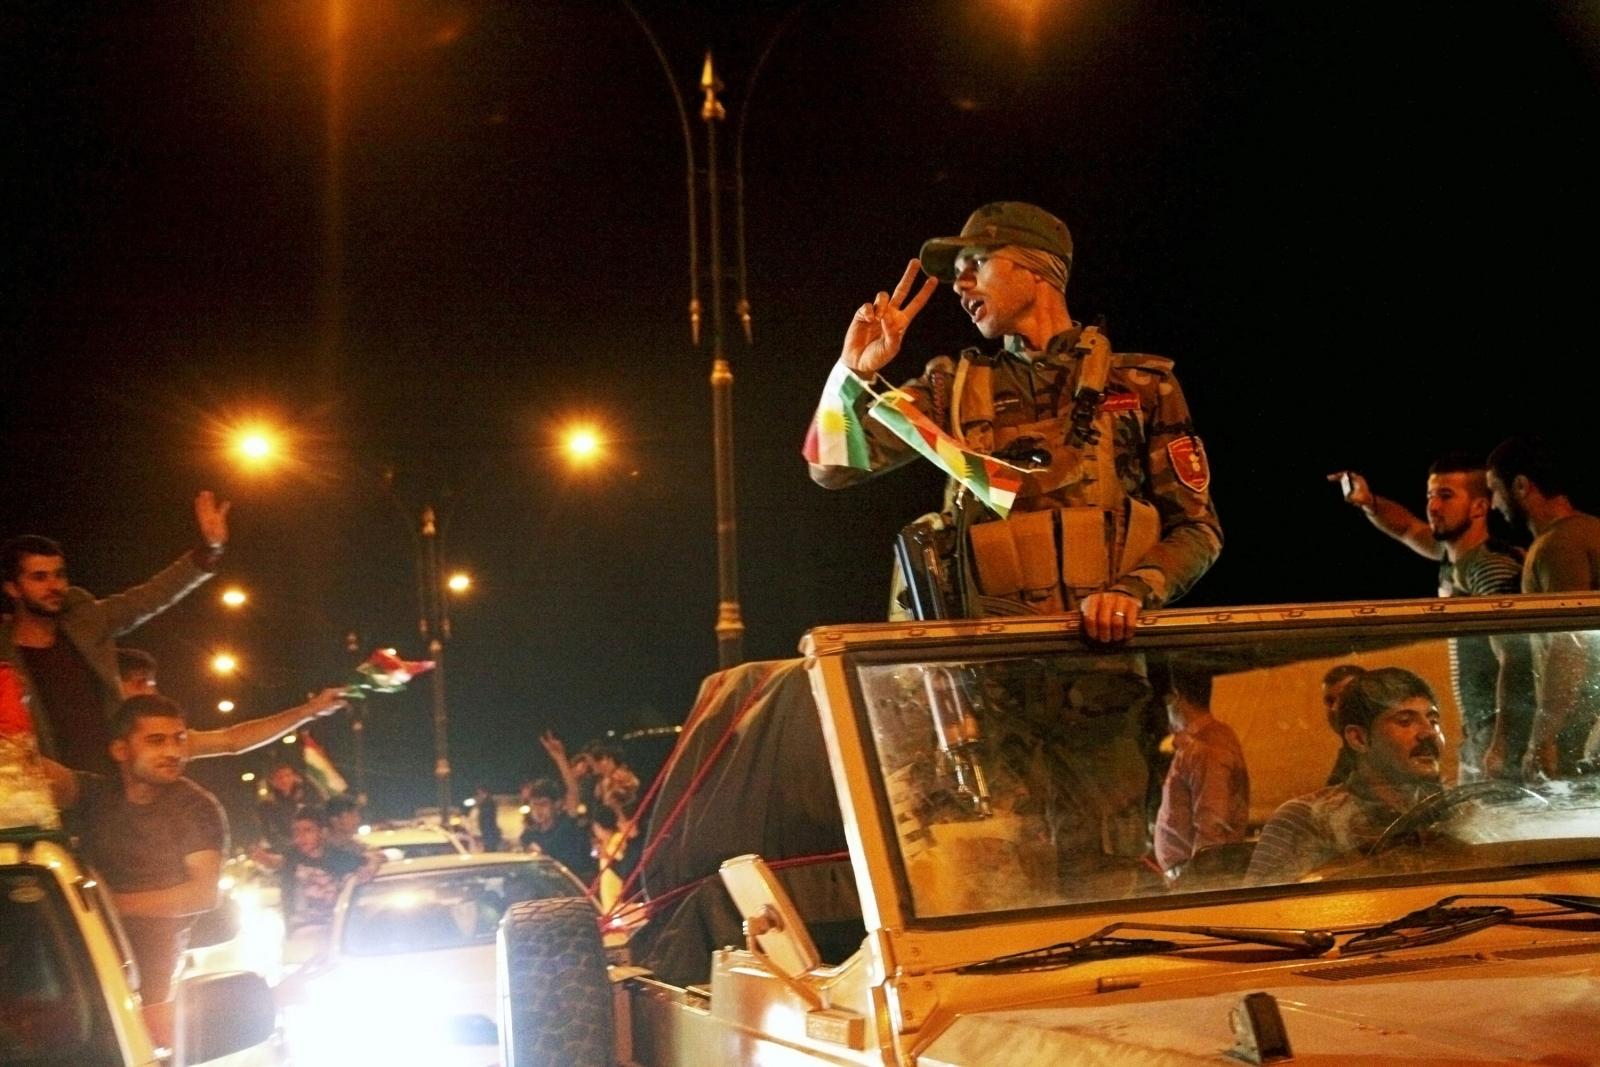 150 Iraqi Peshmerga Fighters Travelling to Syria to Fight Isis